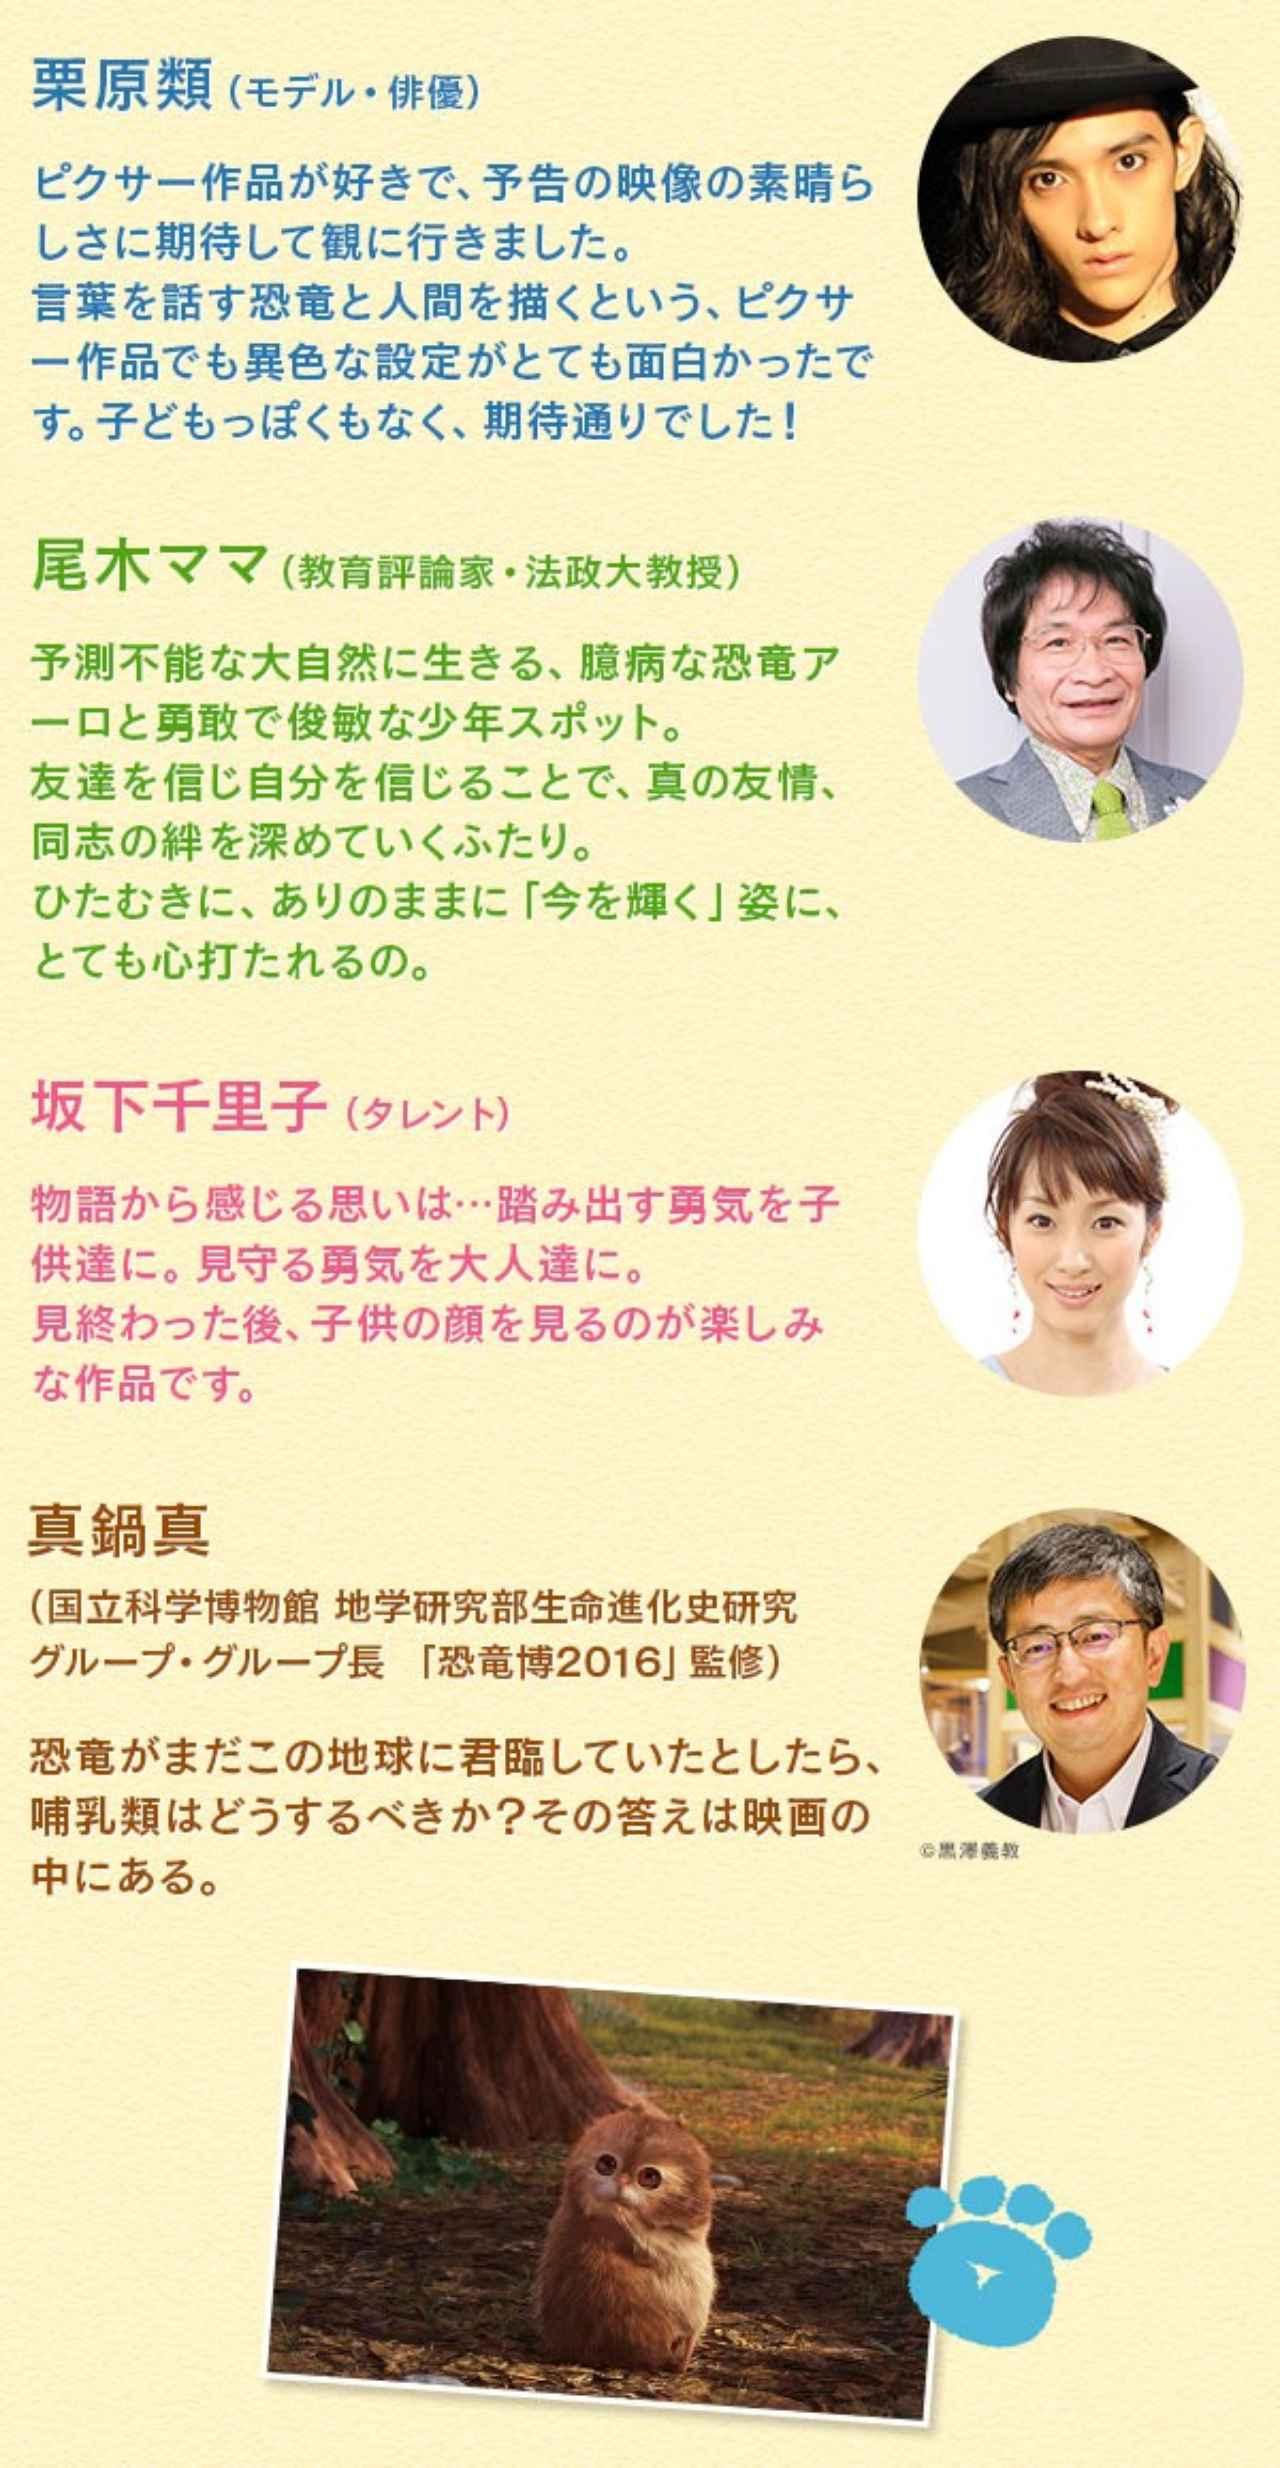 画像4: www.disney.co.jp